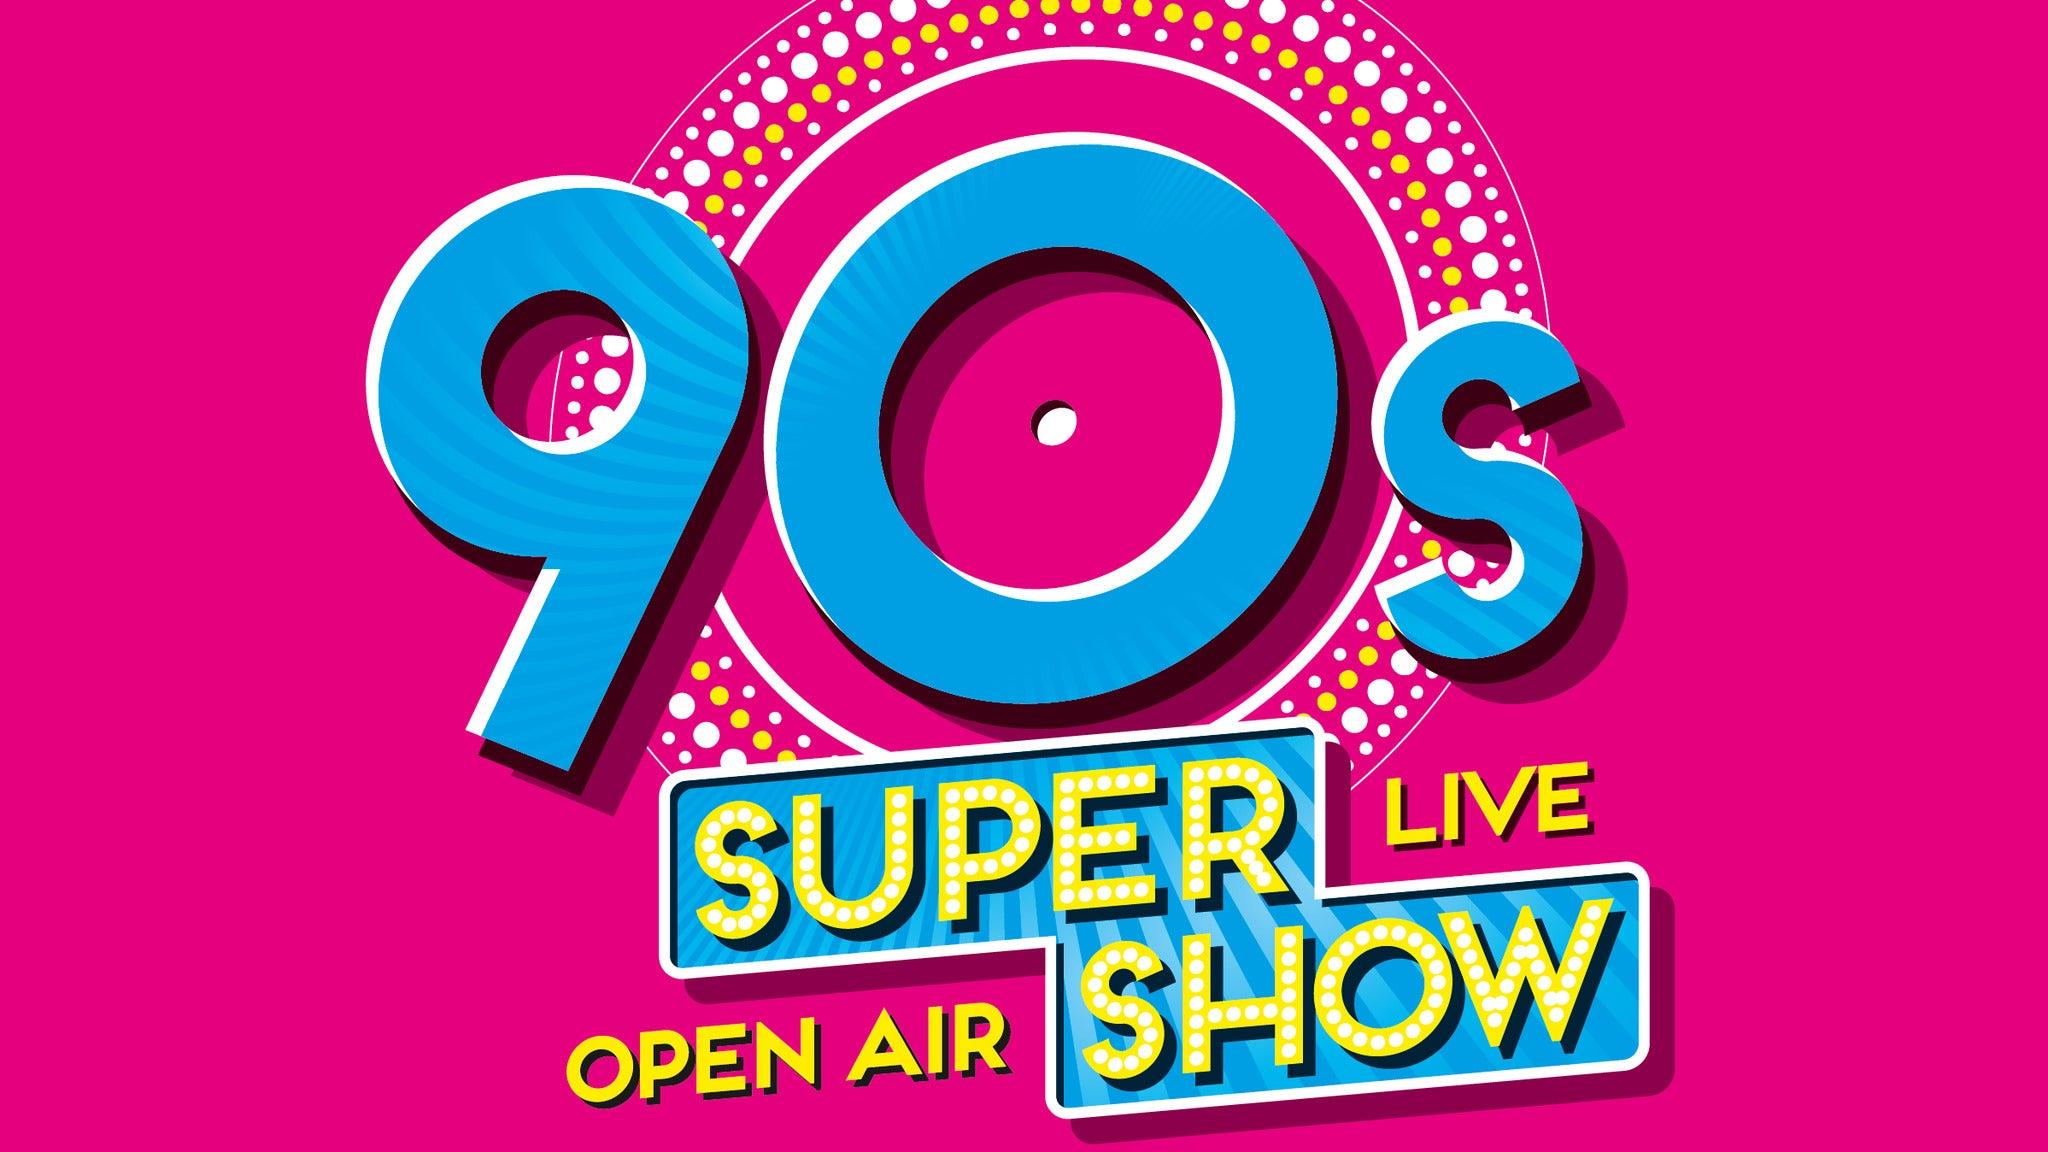 90s Super Show Berlin - live & open air